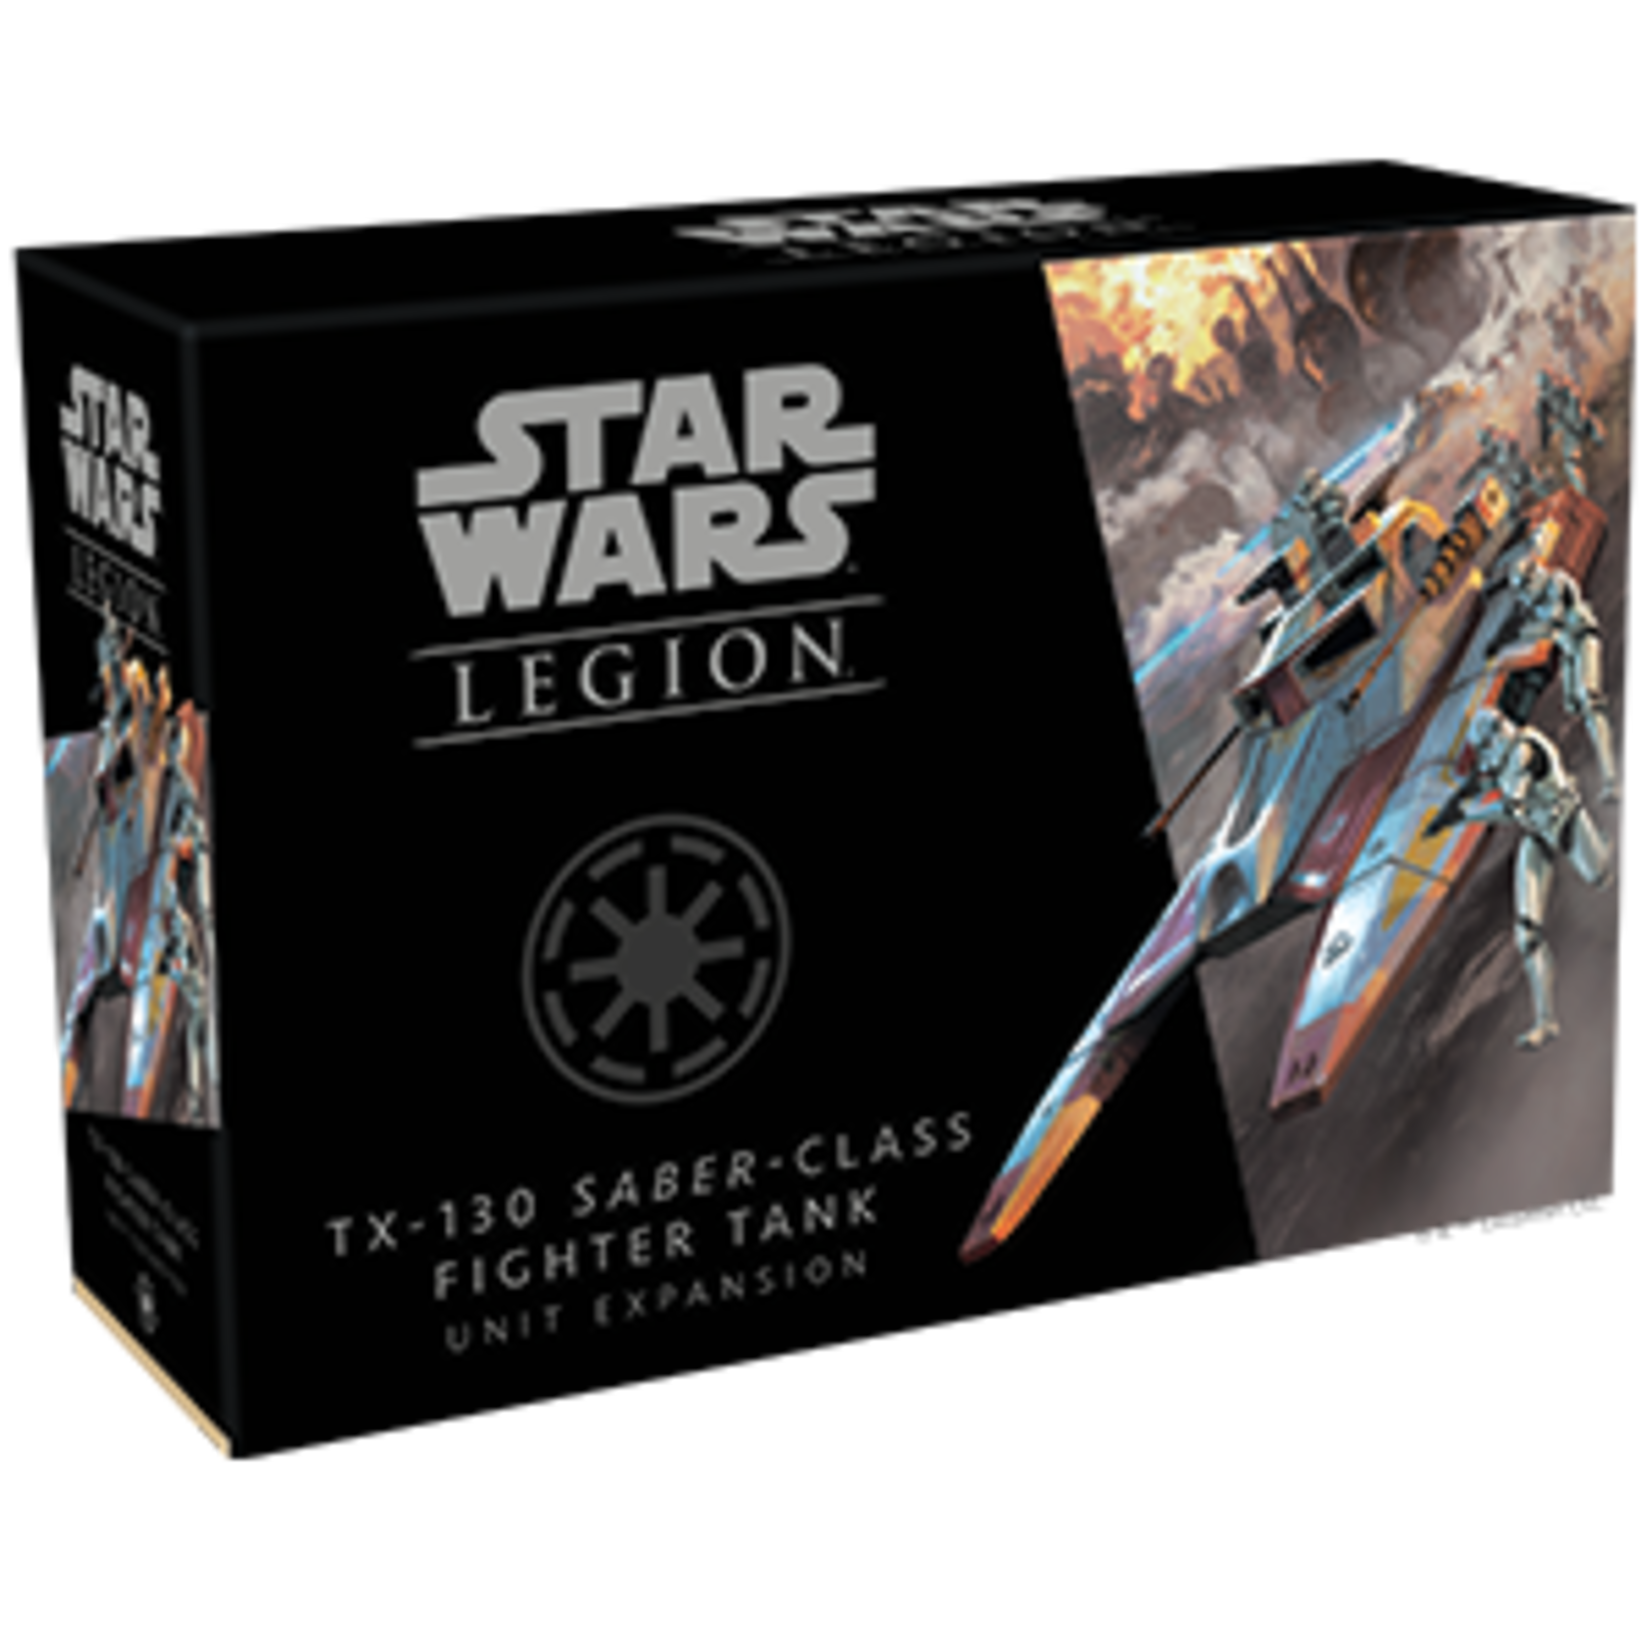 Fantasy Flight Games Star Wars: Legion - TX-130 Saber-class Fighter Tank Unit Expansion